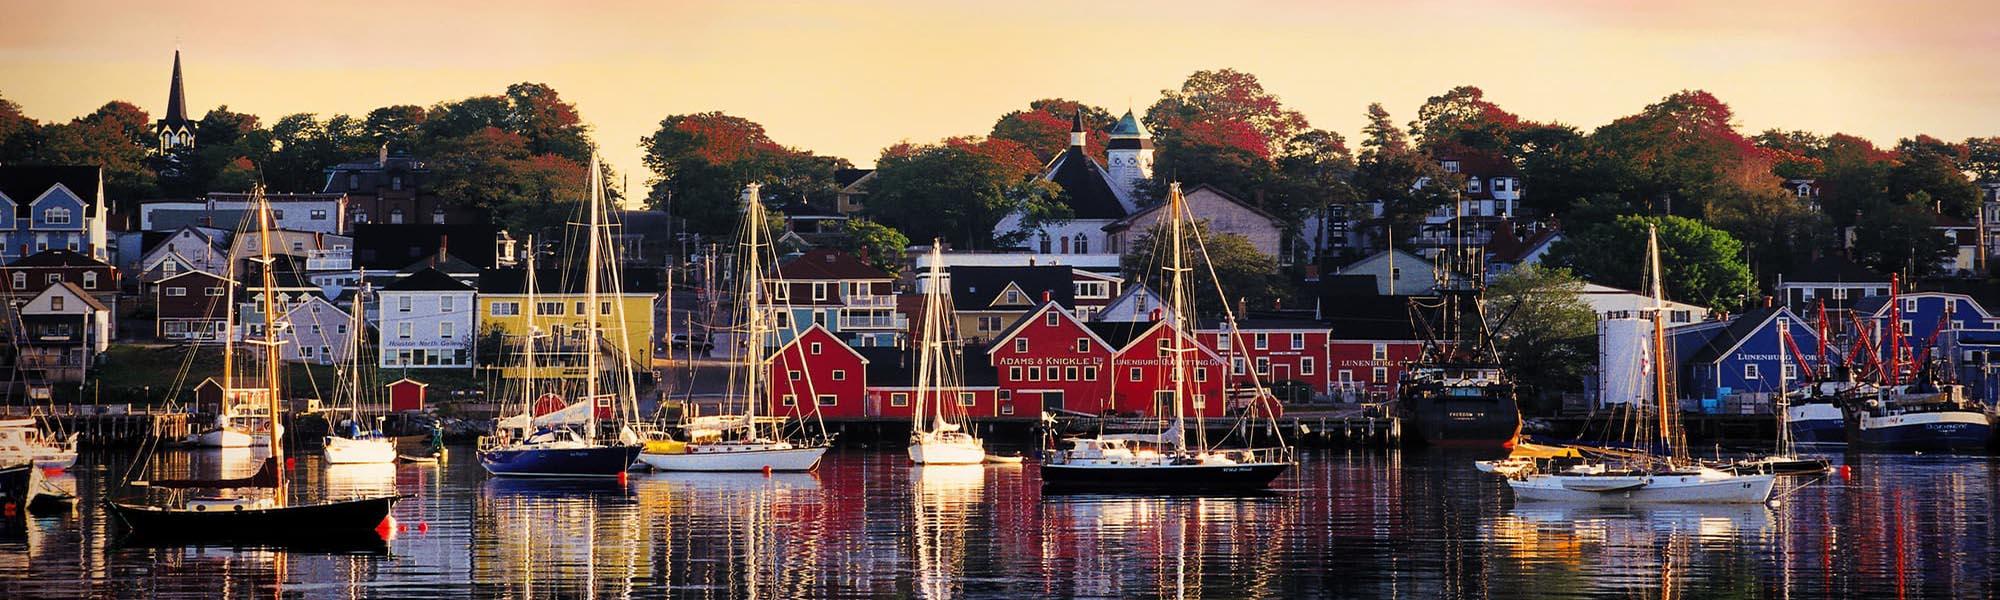 A Glimpse of Nova Scotia   theinternettraveller.com